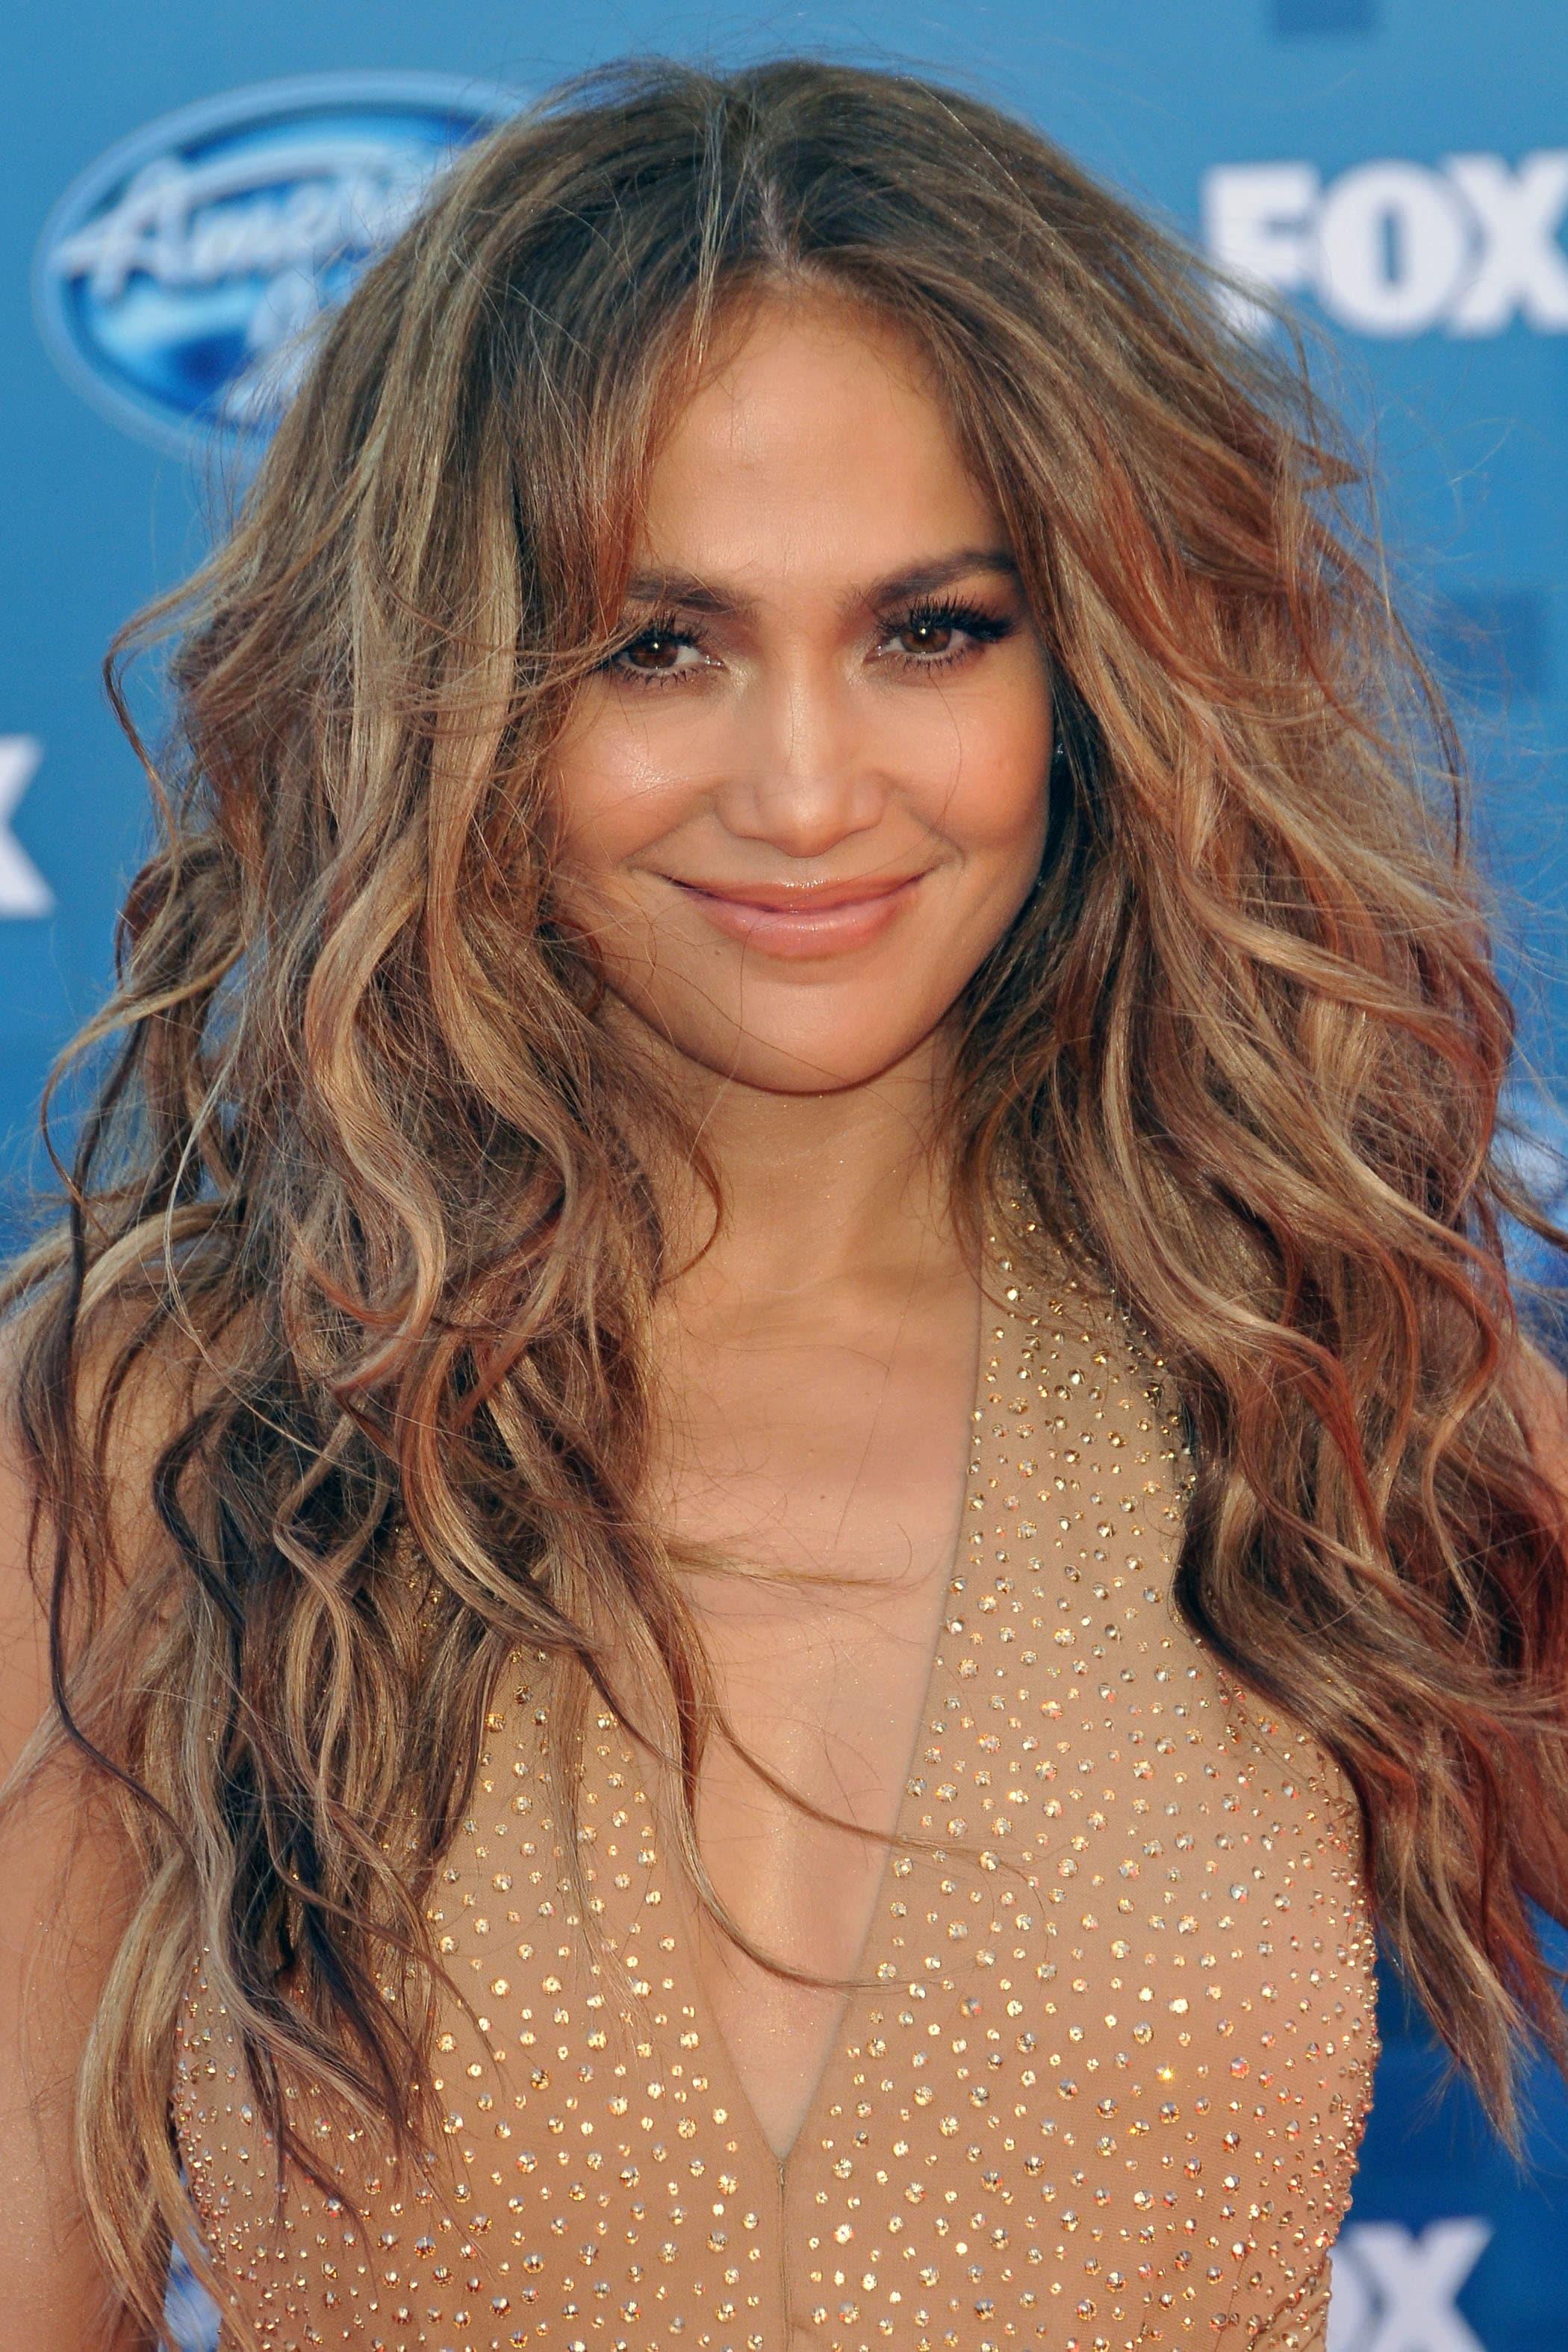 Jennifer Lopez - 2011 - mane moments - big voluminous wavy hair in light brown with blond ehighlights